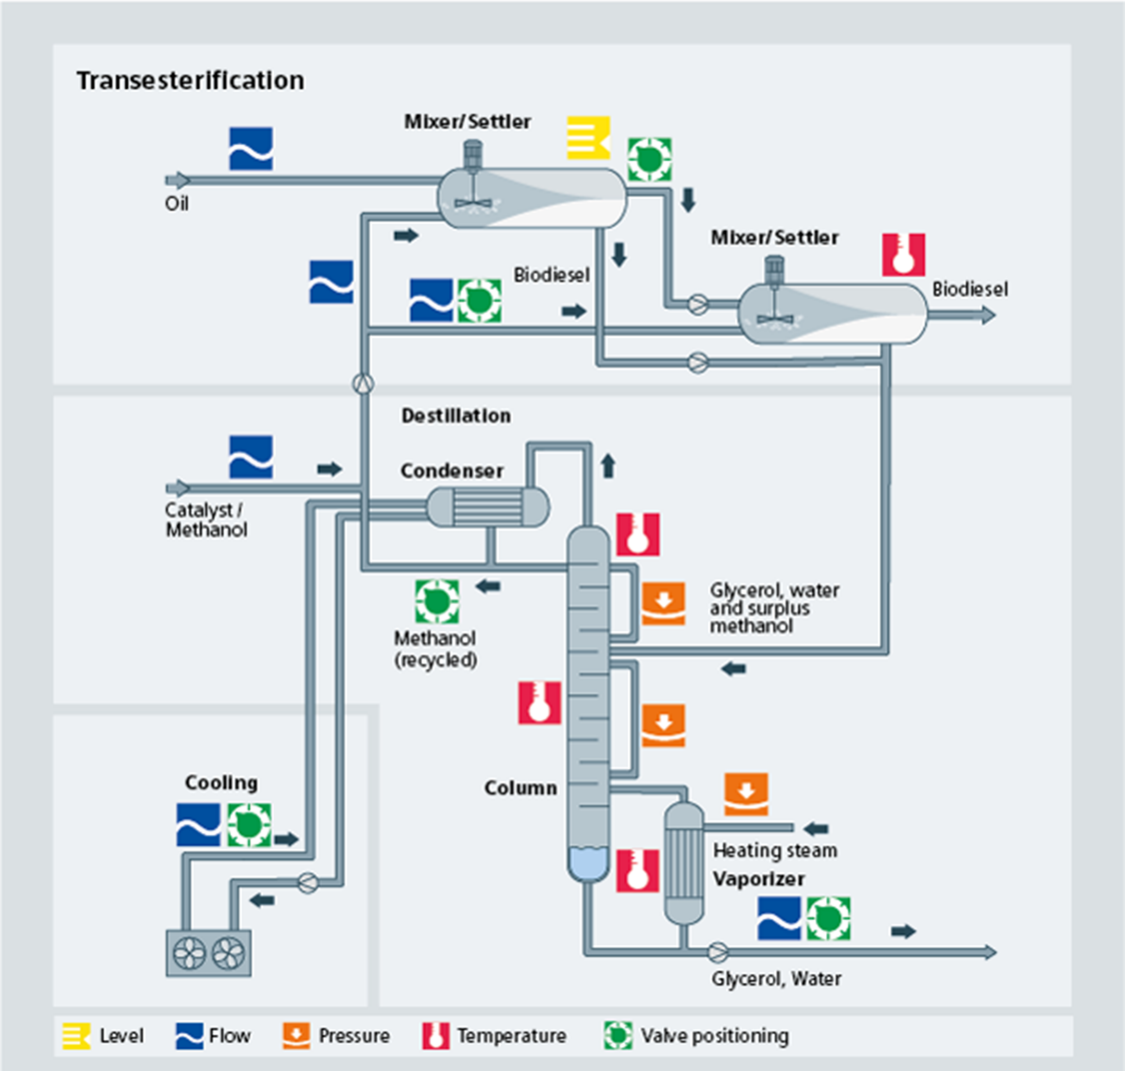 Biodiesel transesterification process diagram - Siemens USA